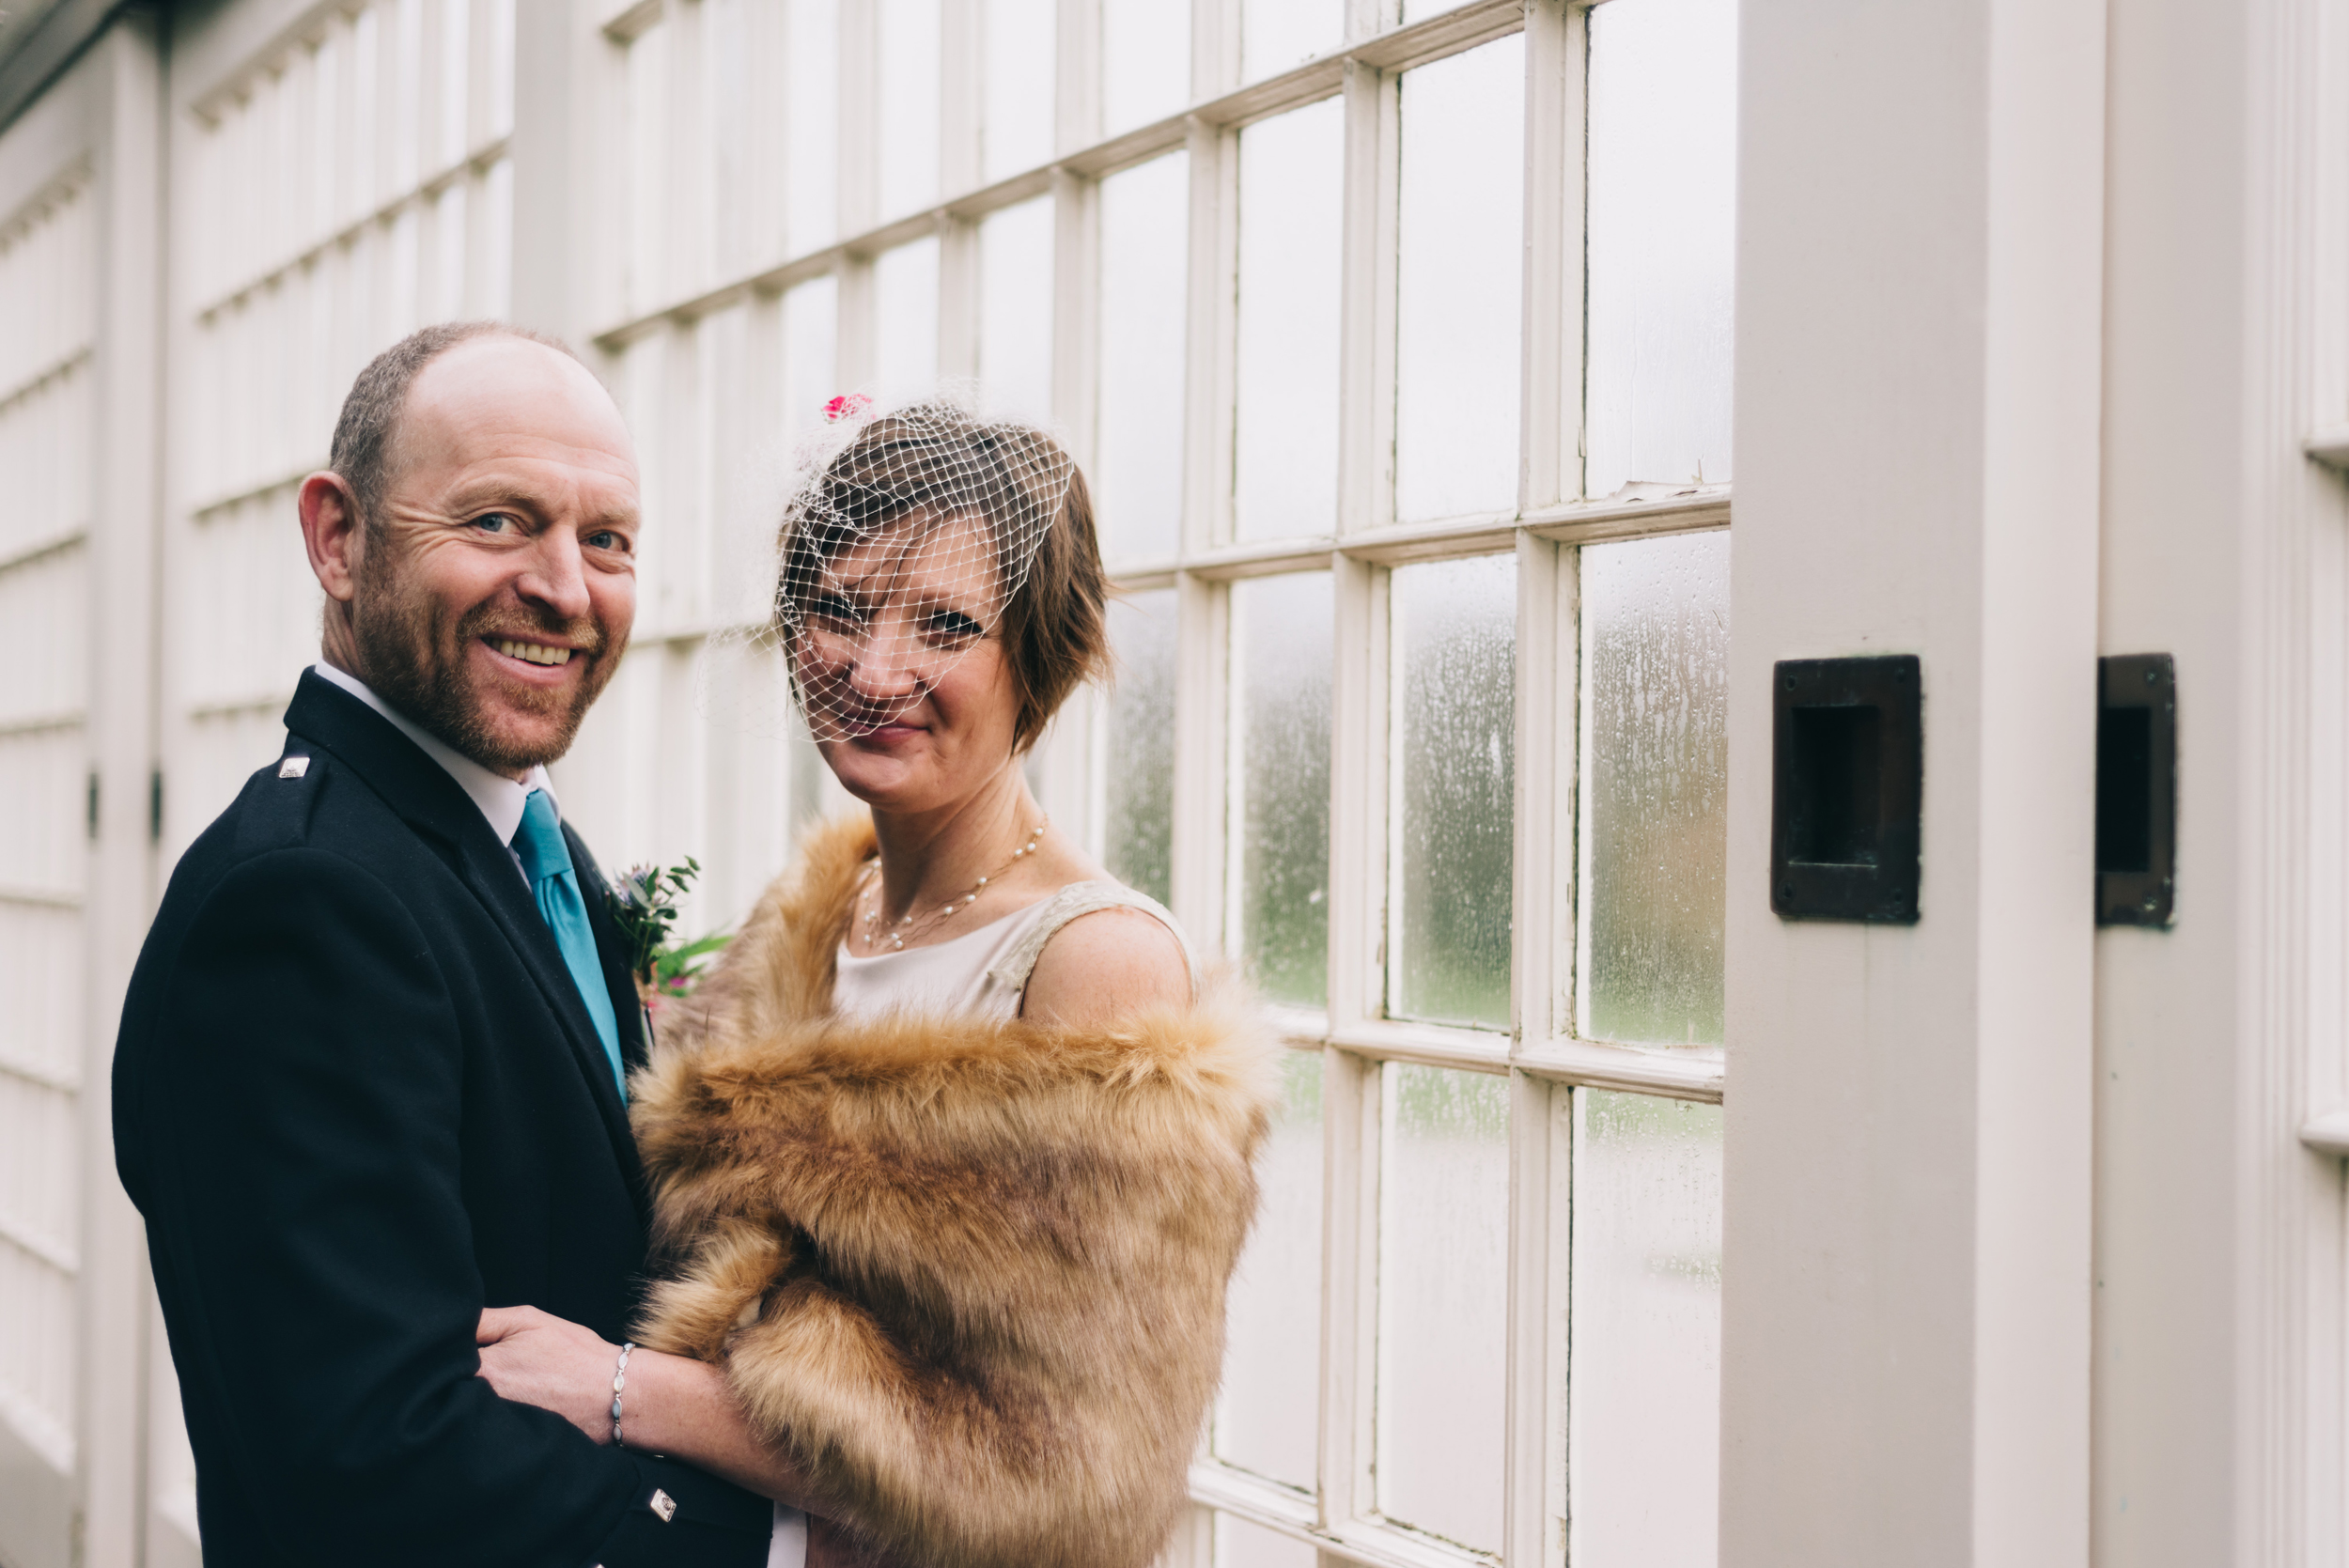 Alice-Bias-Cut-Silk-Wedding-Dress-Kate-Beaumont-Sheffield-Botanical-Gardens-by-Peakography-16.jpg